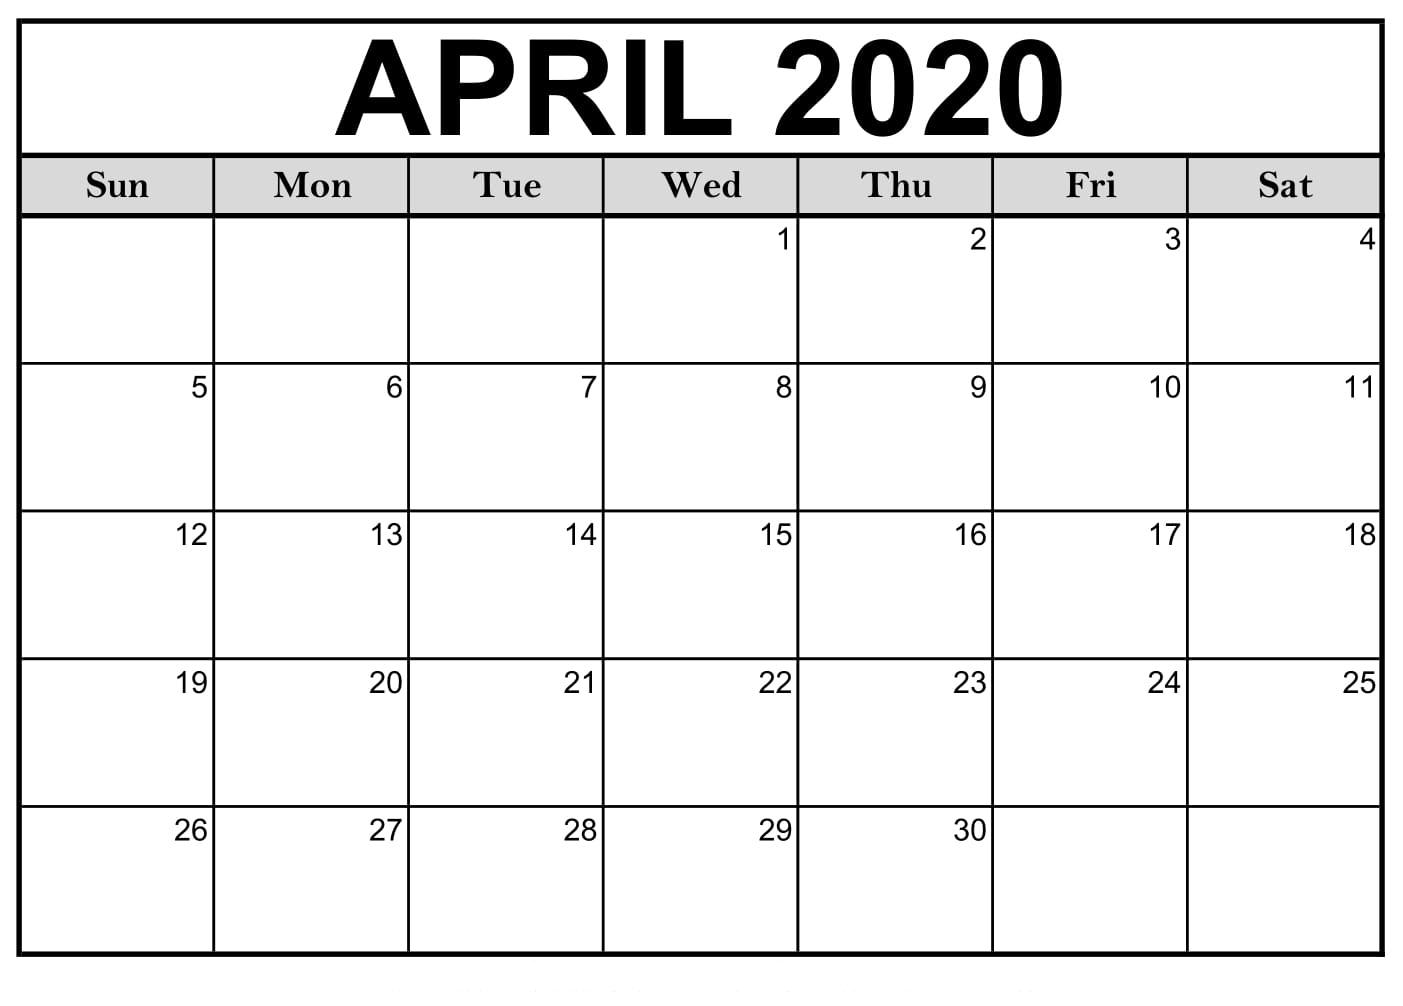 April 2020 Calendar Printable Monthly Calendar |Idea  Printable Monthly Calendar Templates